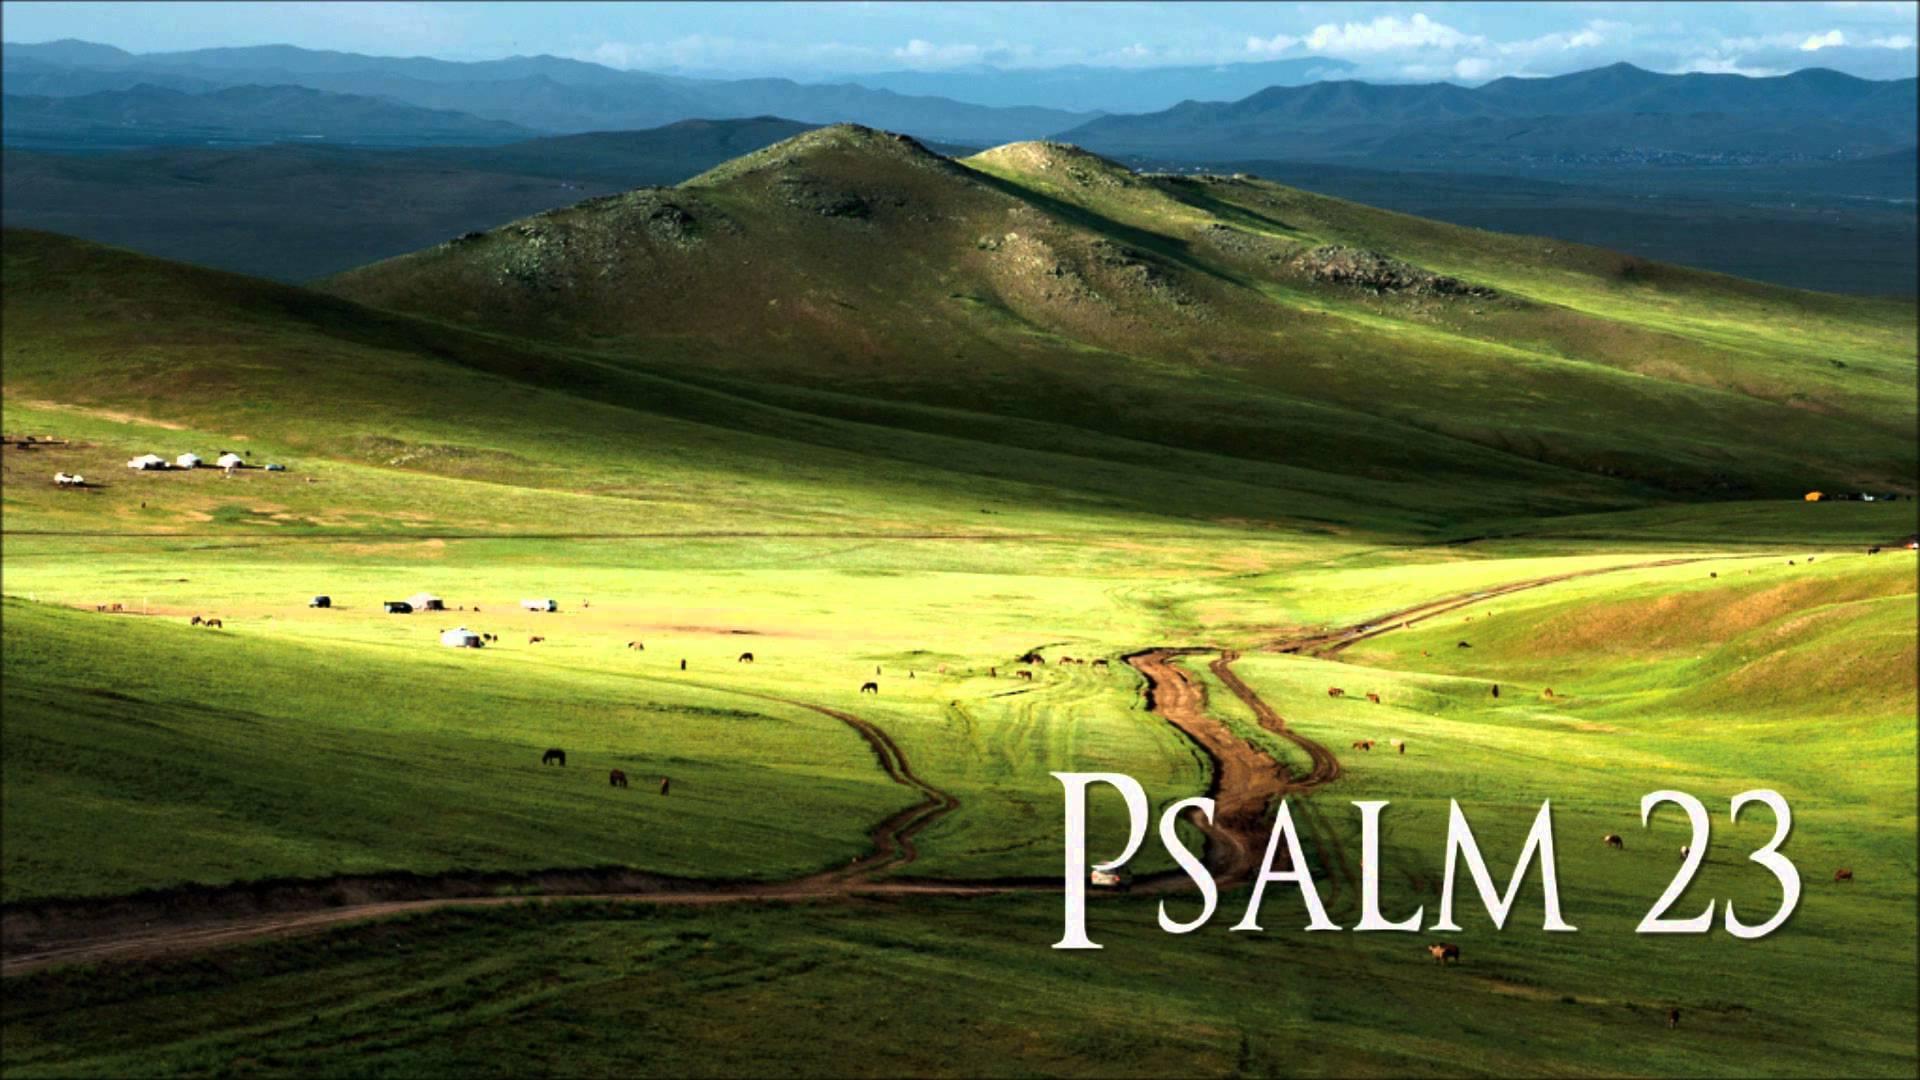 essays on psalms 23 Similar Essays